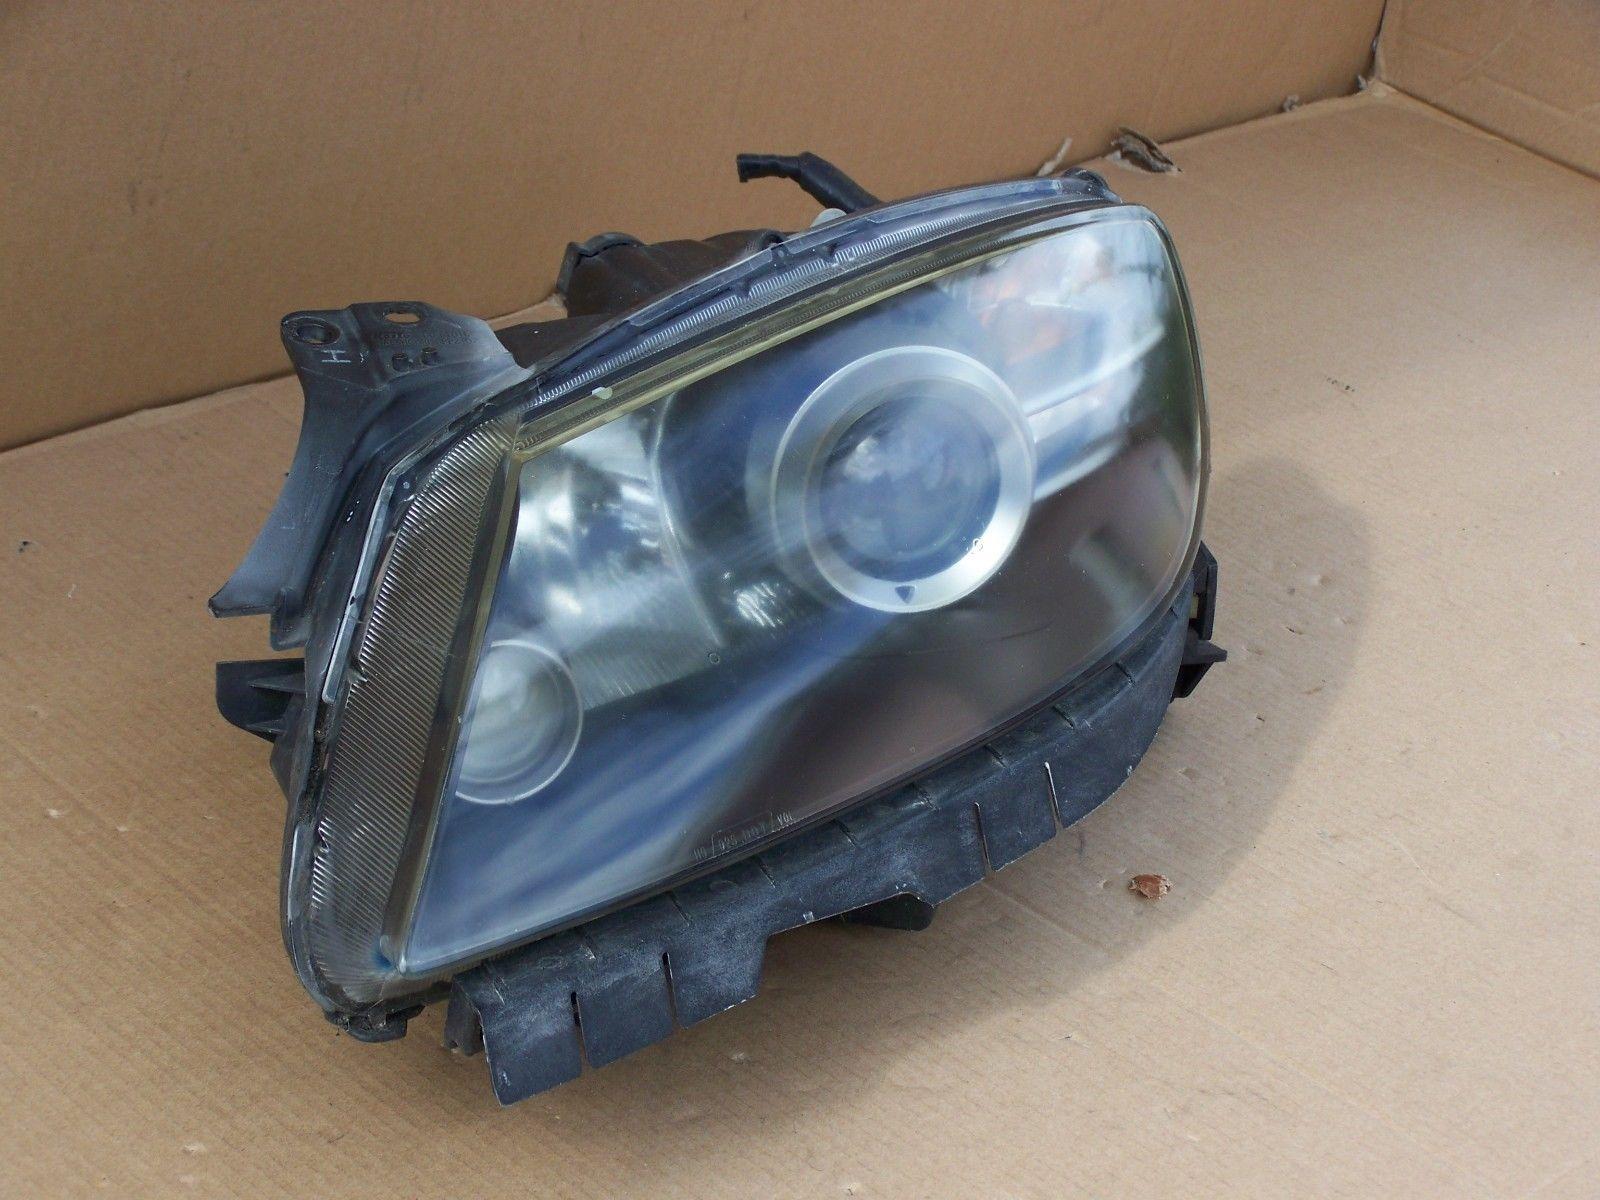 04 08 mazda rx 8 rx8 headlight hid xenon left lh oem